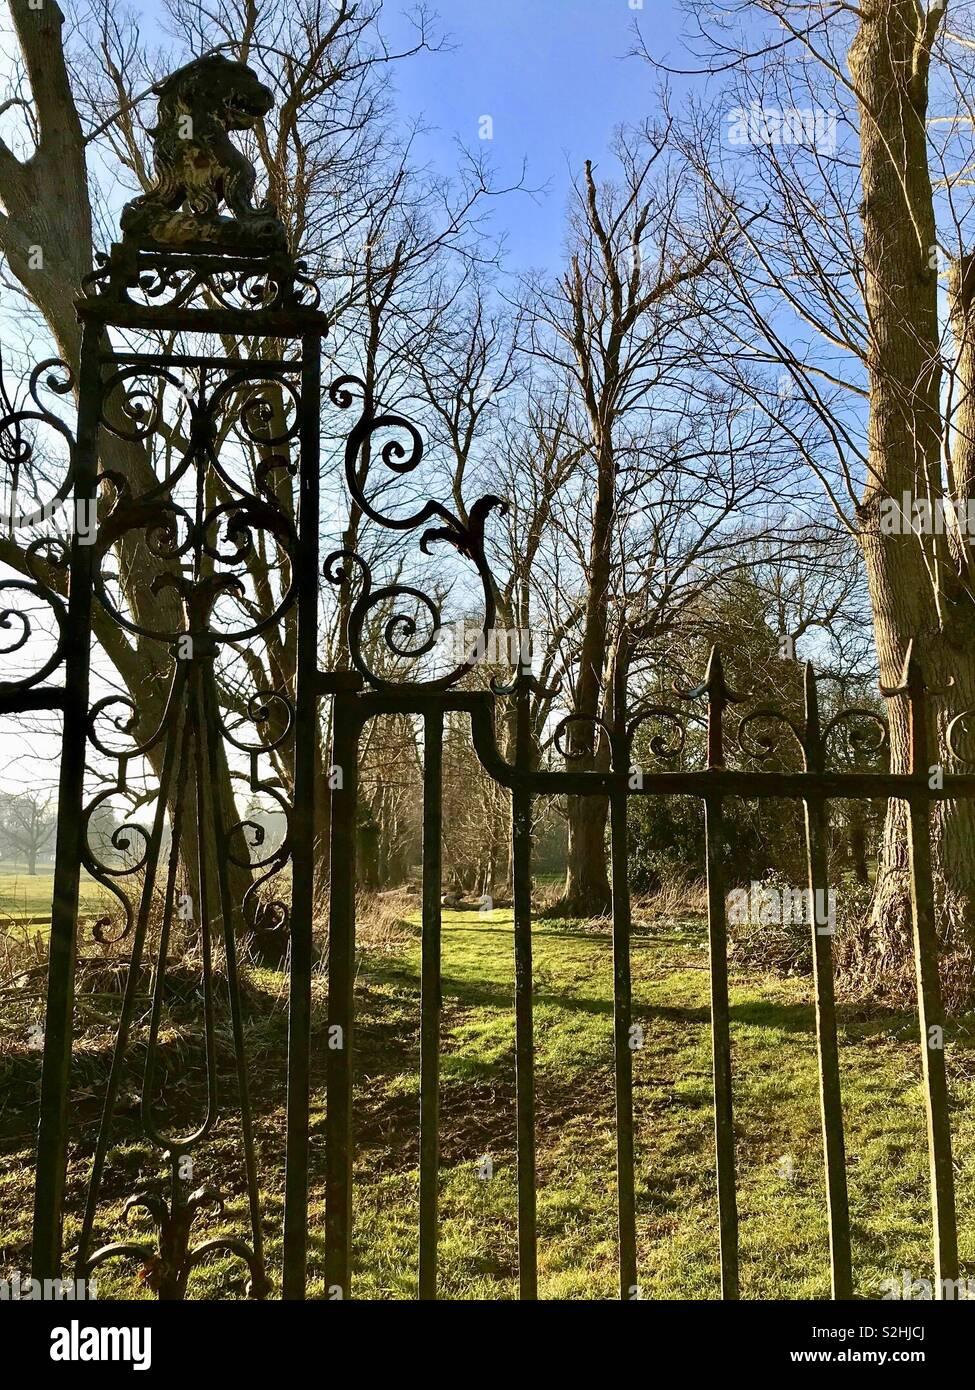 Cast iron railings with a lion, English parkland - Stock Image